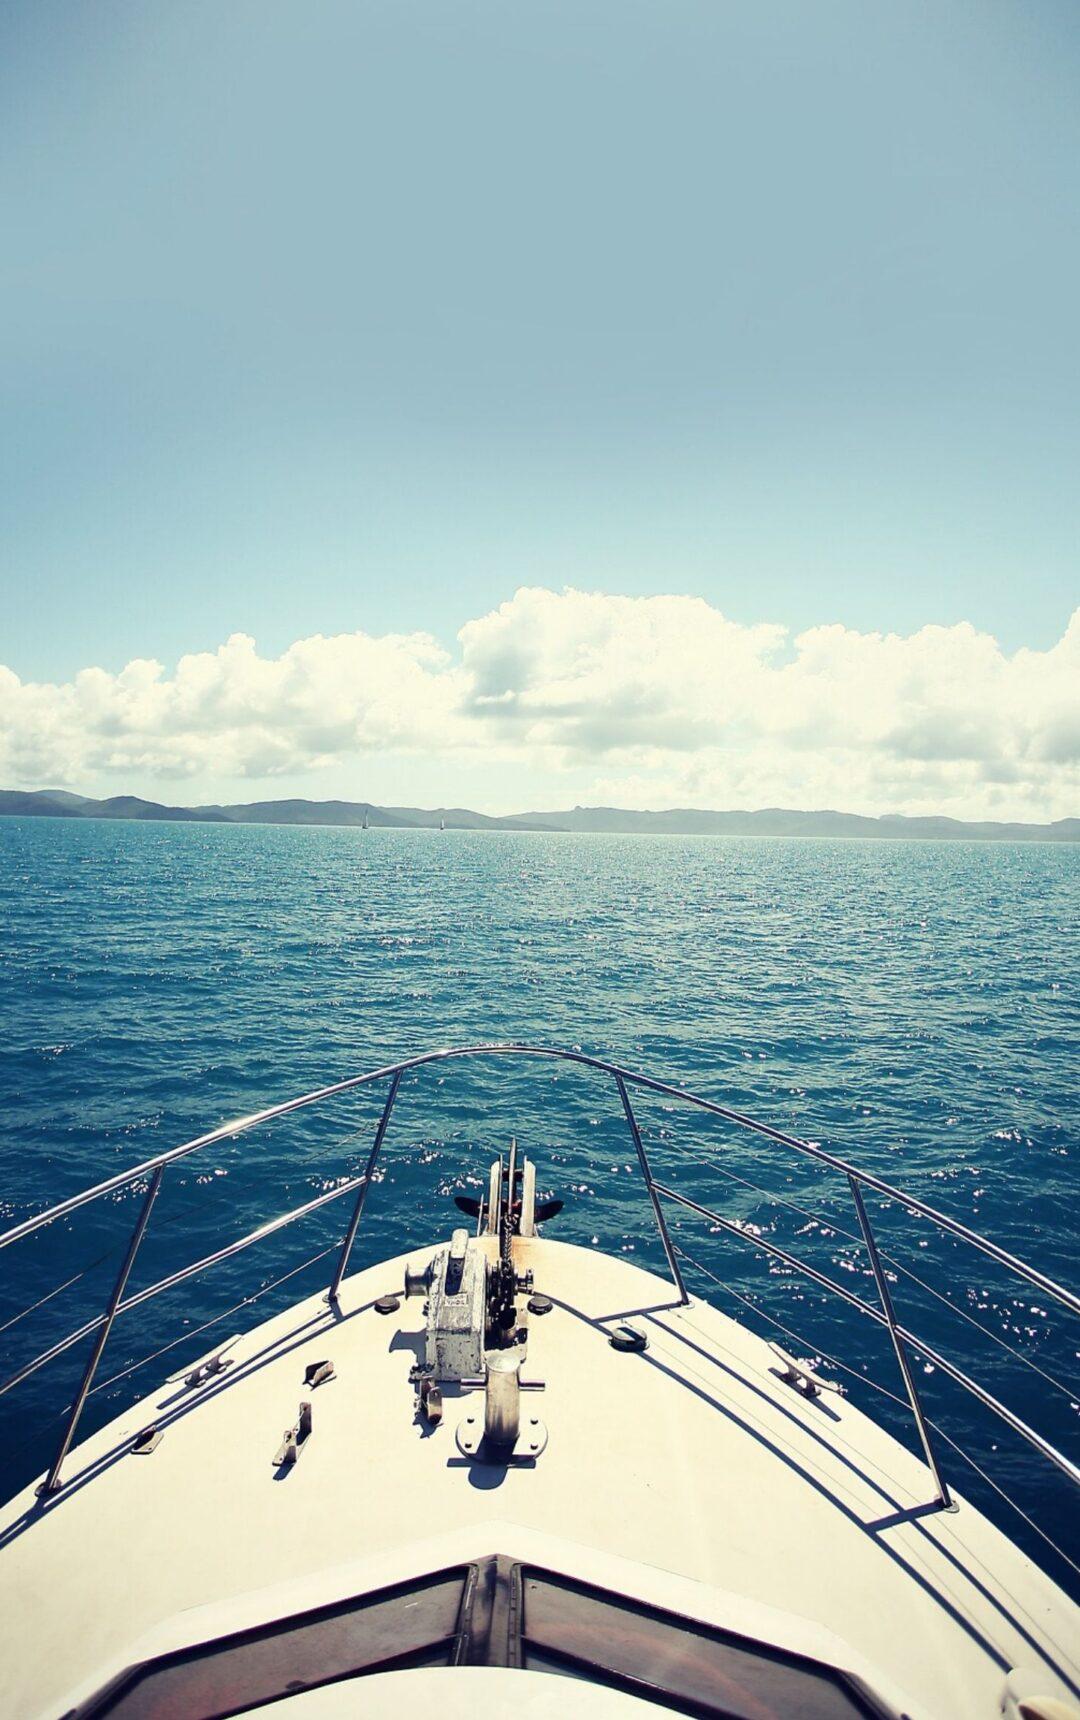 Crucero - Jminyetty Travel